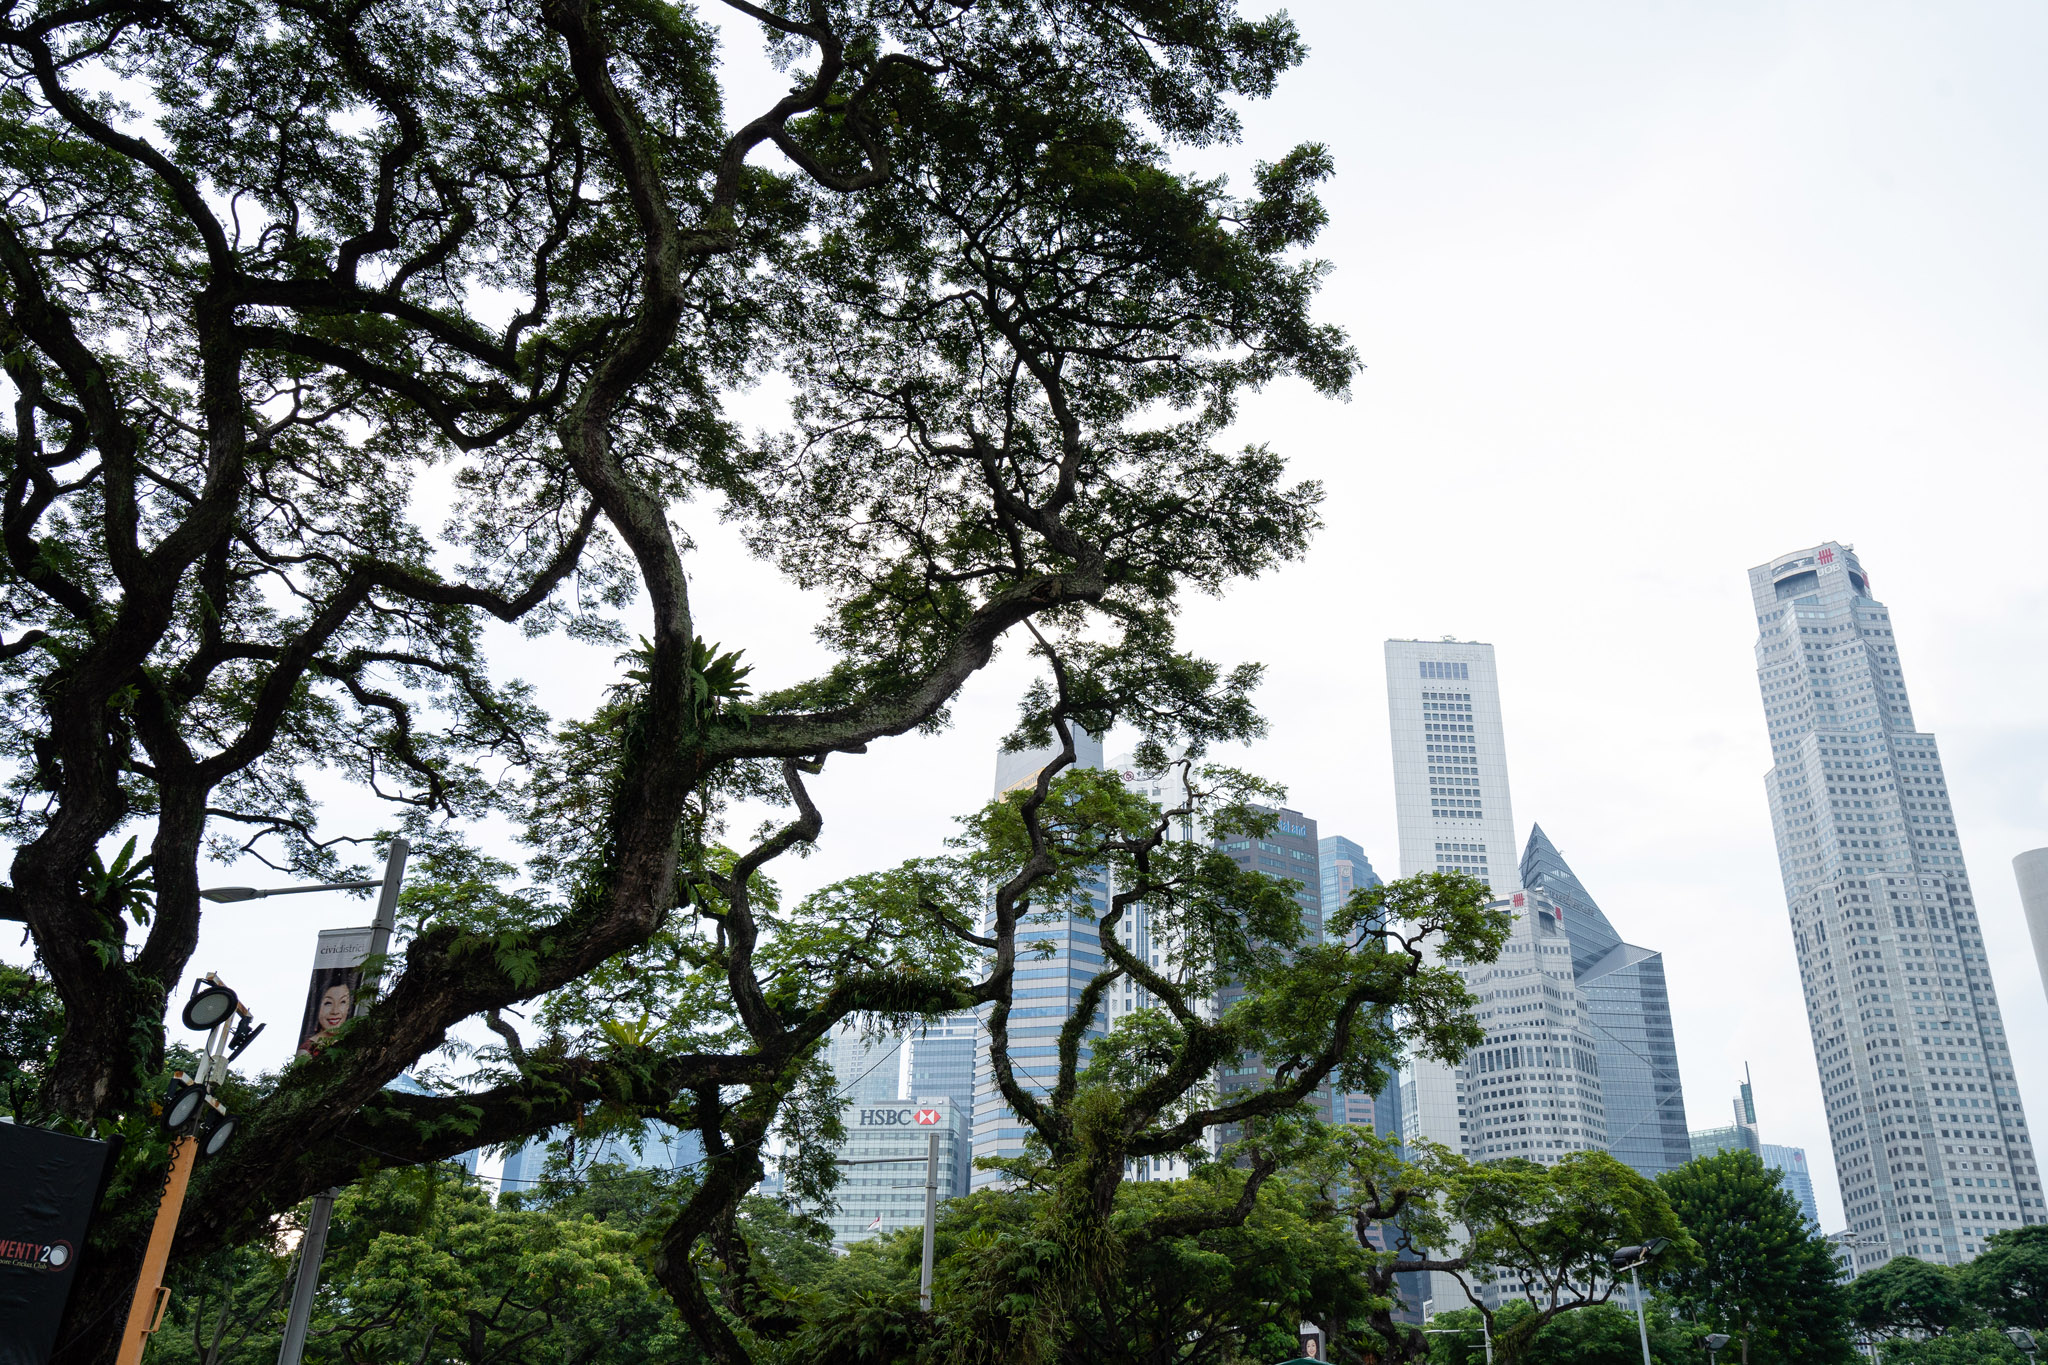 viator-singapore-photographer-tourism-tours-zoo-little-india-gardens-marina-bay-001.jpg